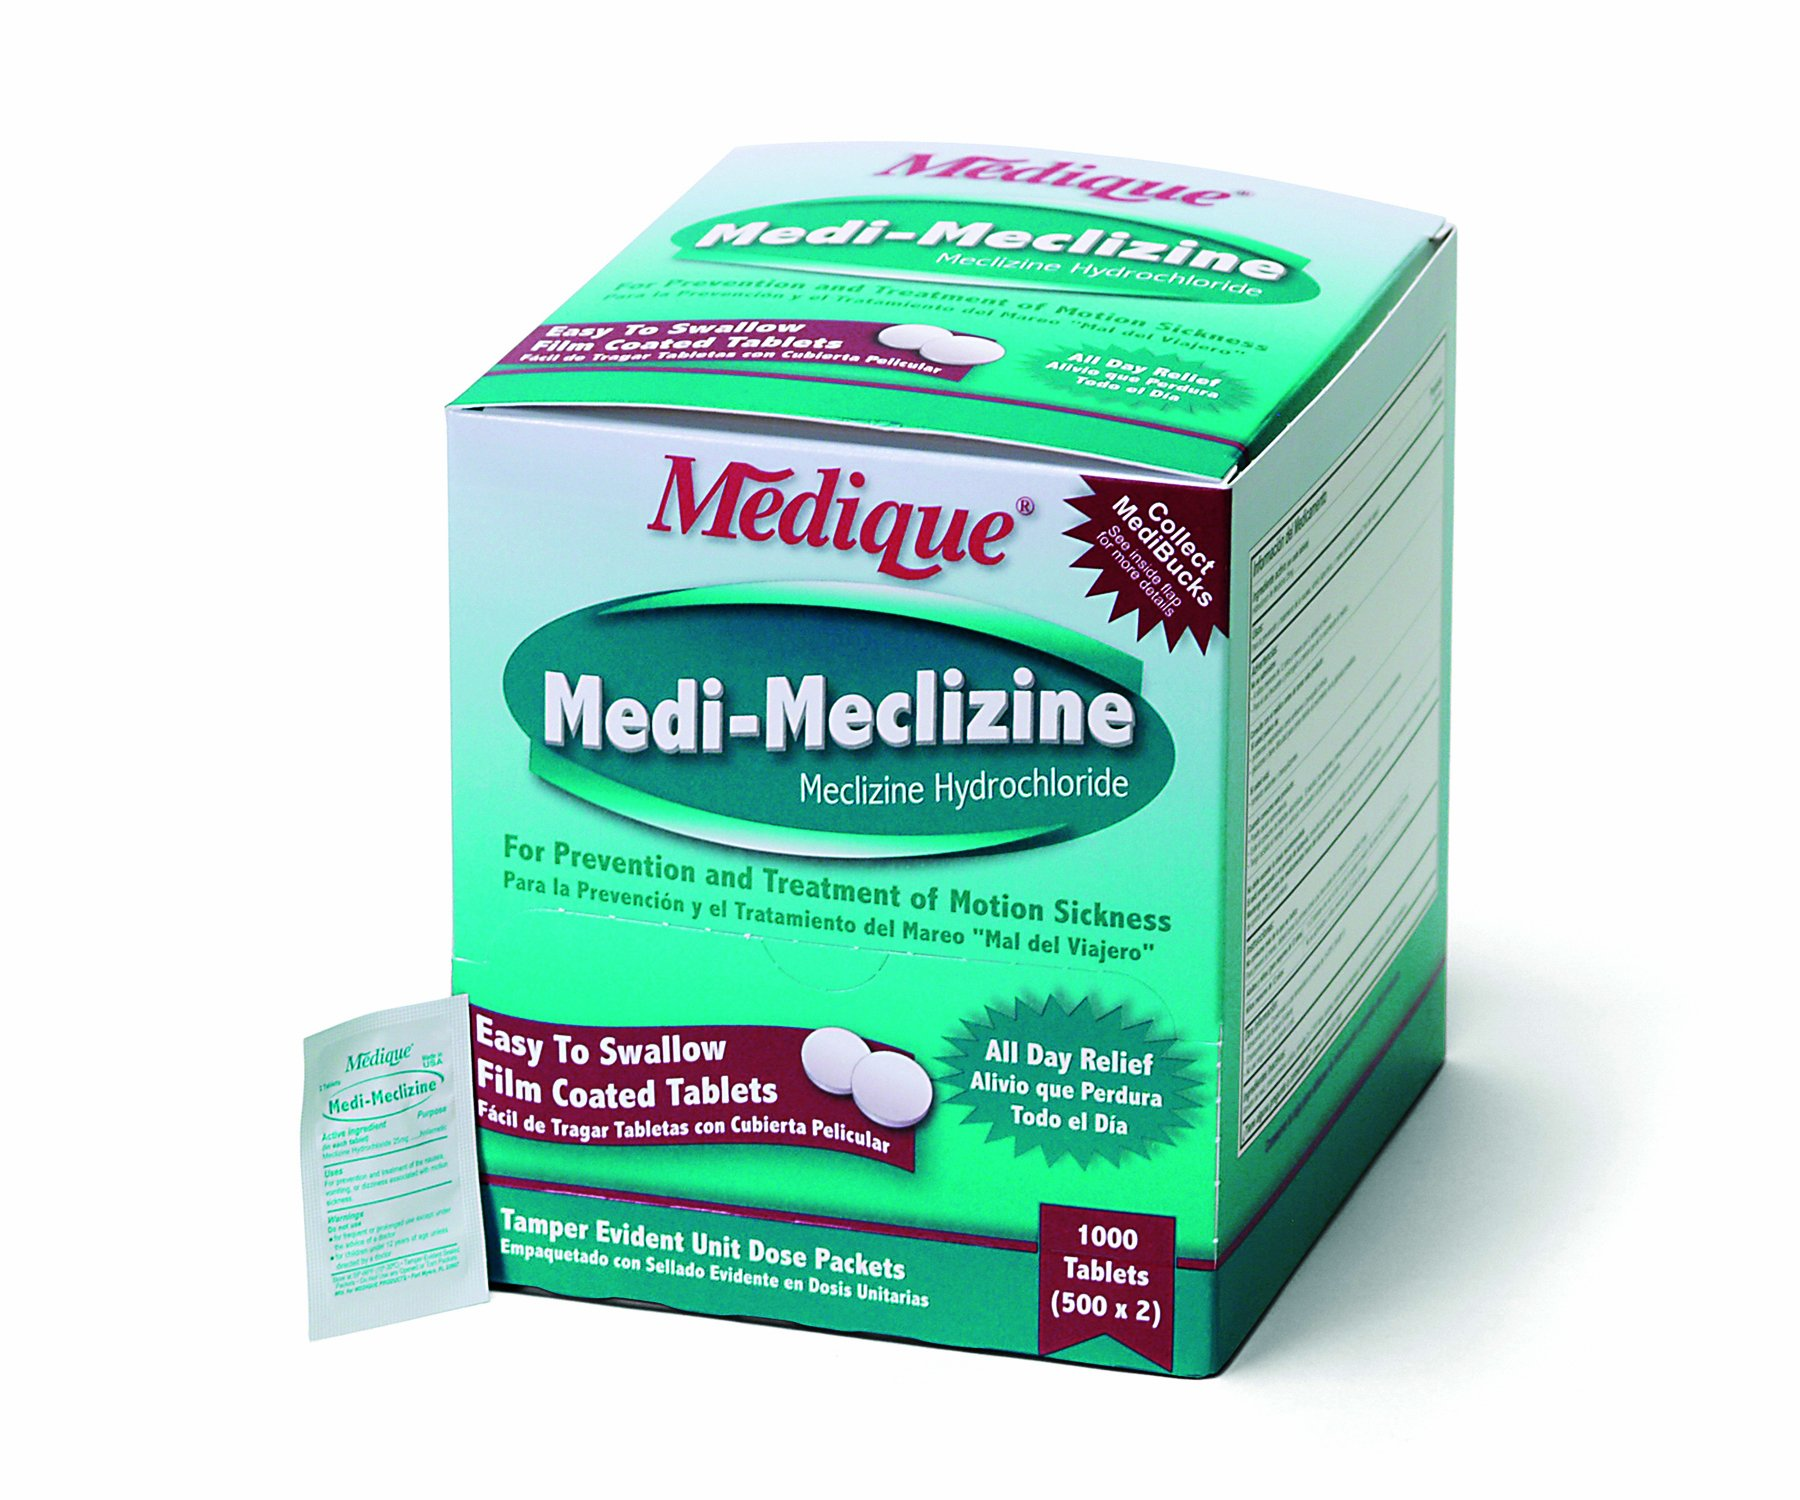 Medique Products Medi-Meclizine, Motion Sickness Medication - 500 Tablets by Medique